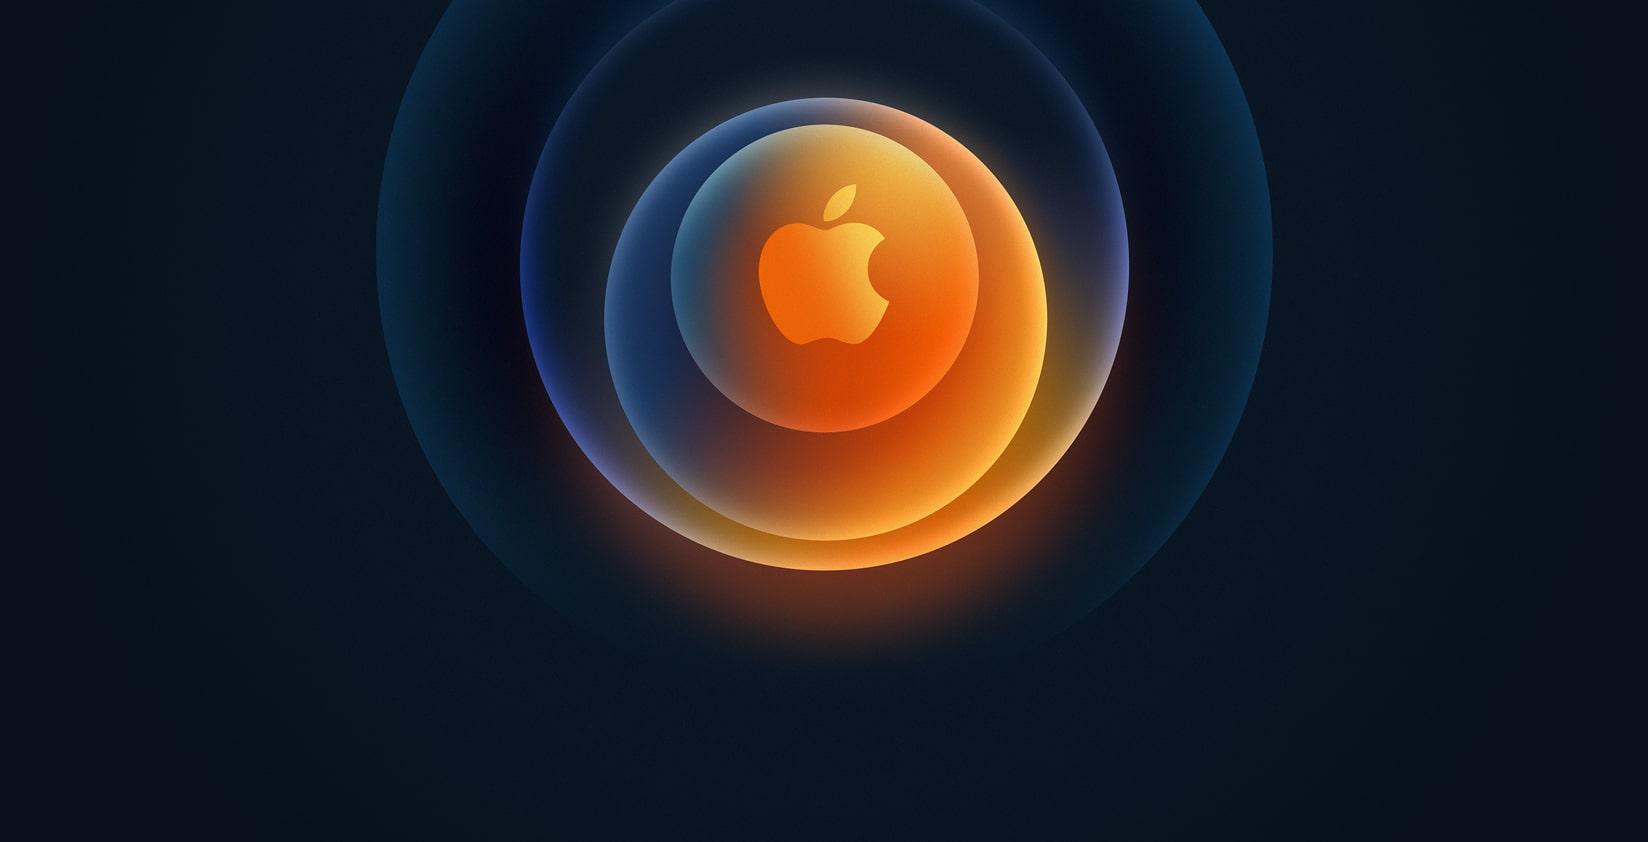 apple event hero__d6adldydsqye_large-min